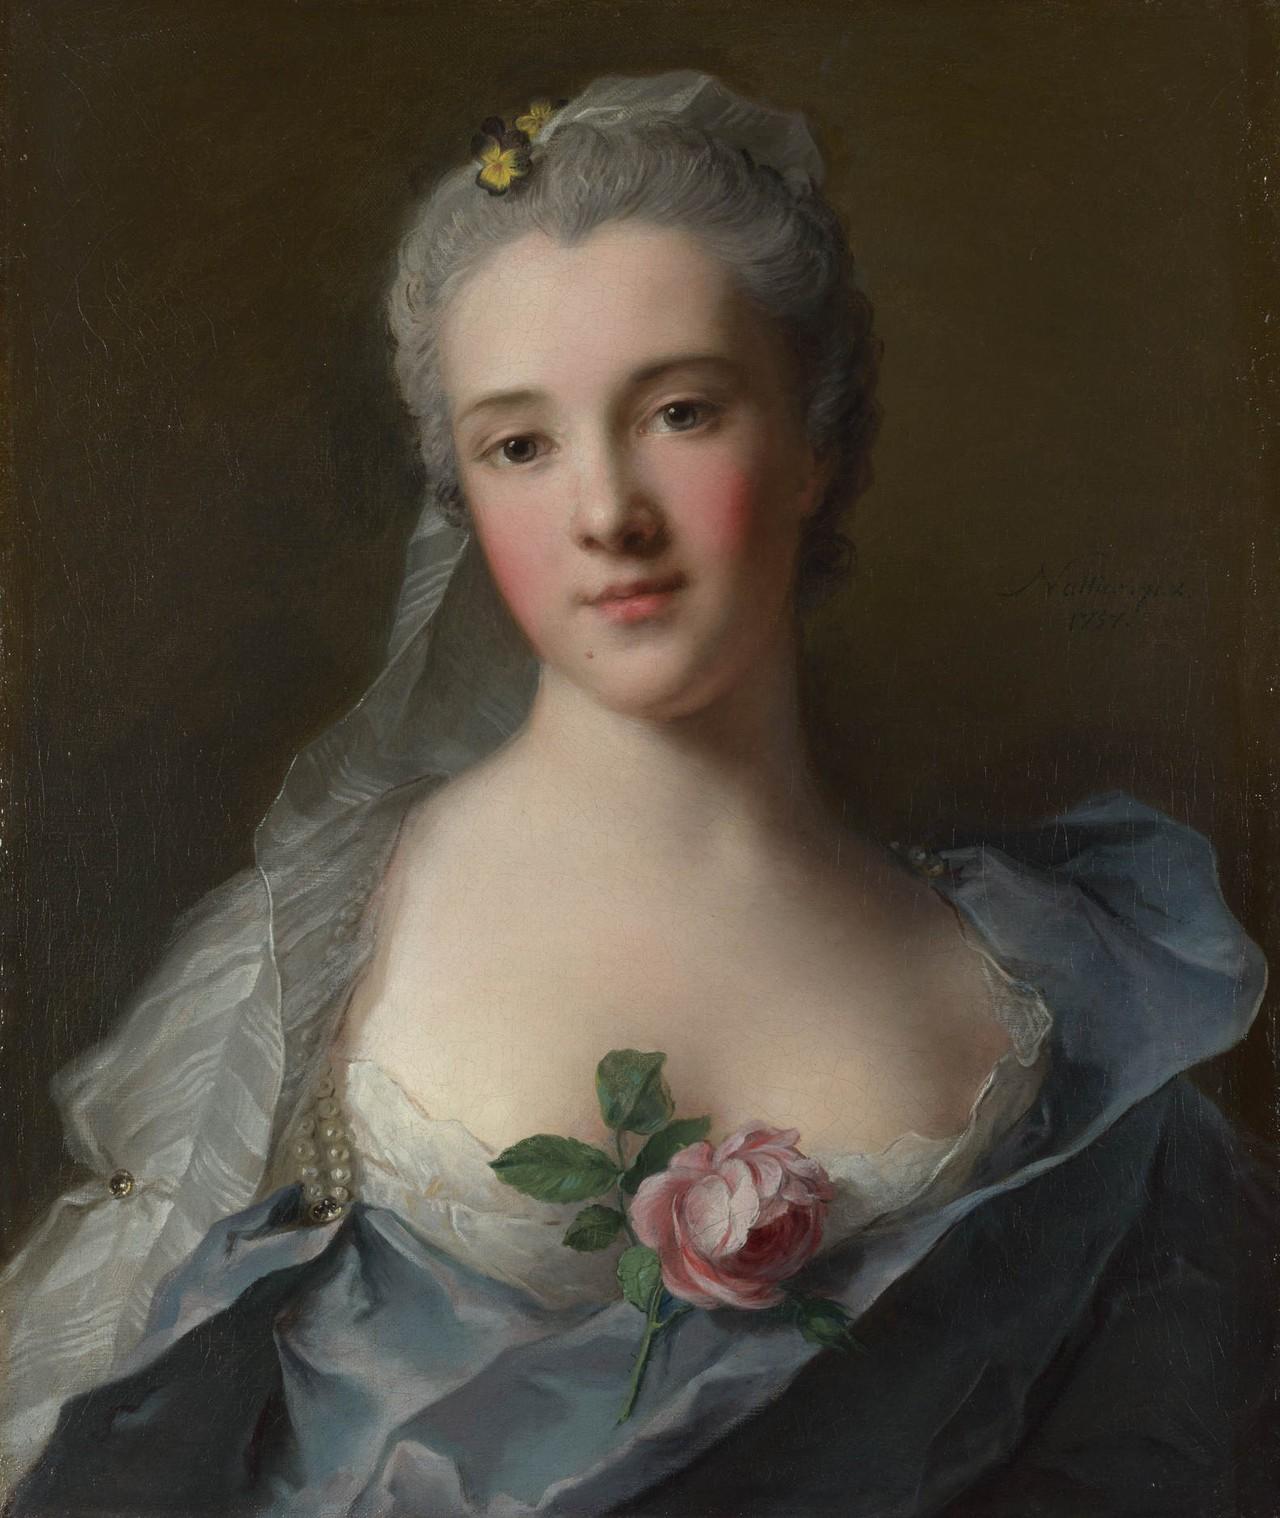 Portrait of Manon Balletti, by Jean-Marc Nattier, 1757. The National Gallery, London.